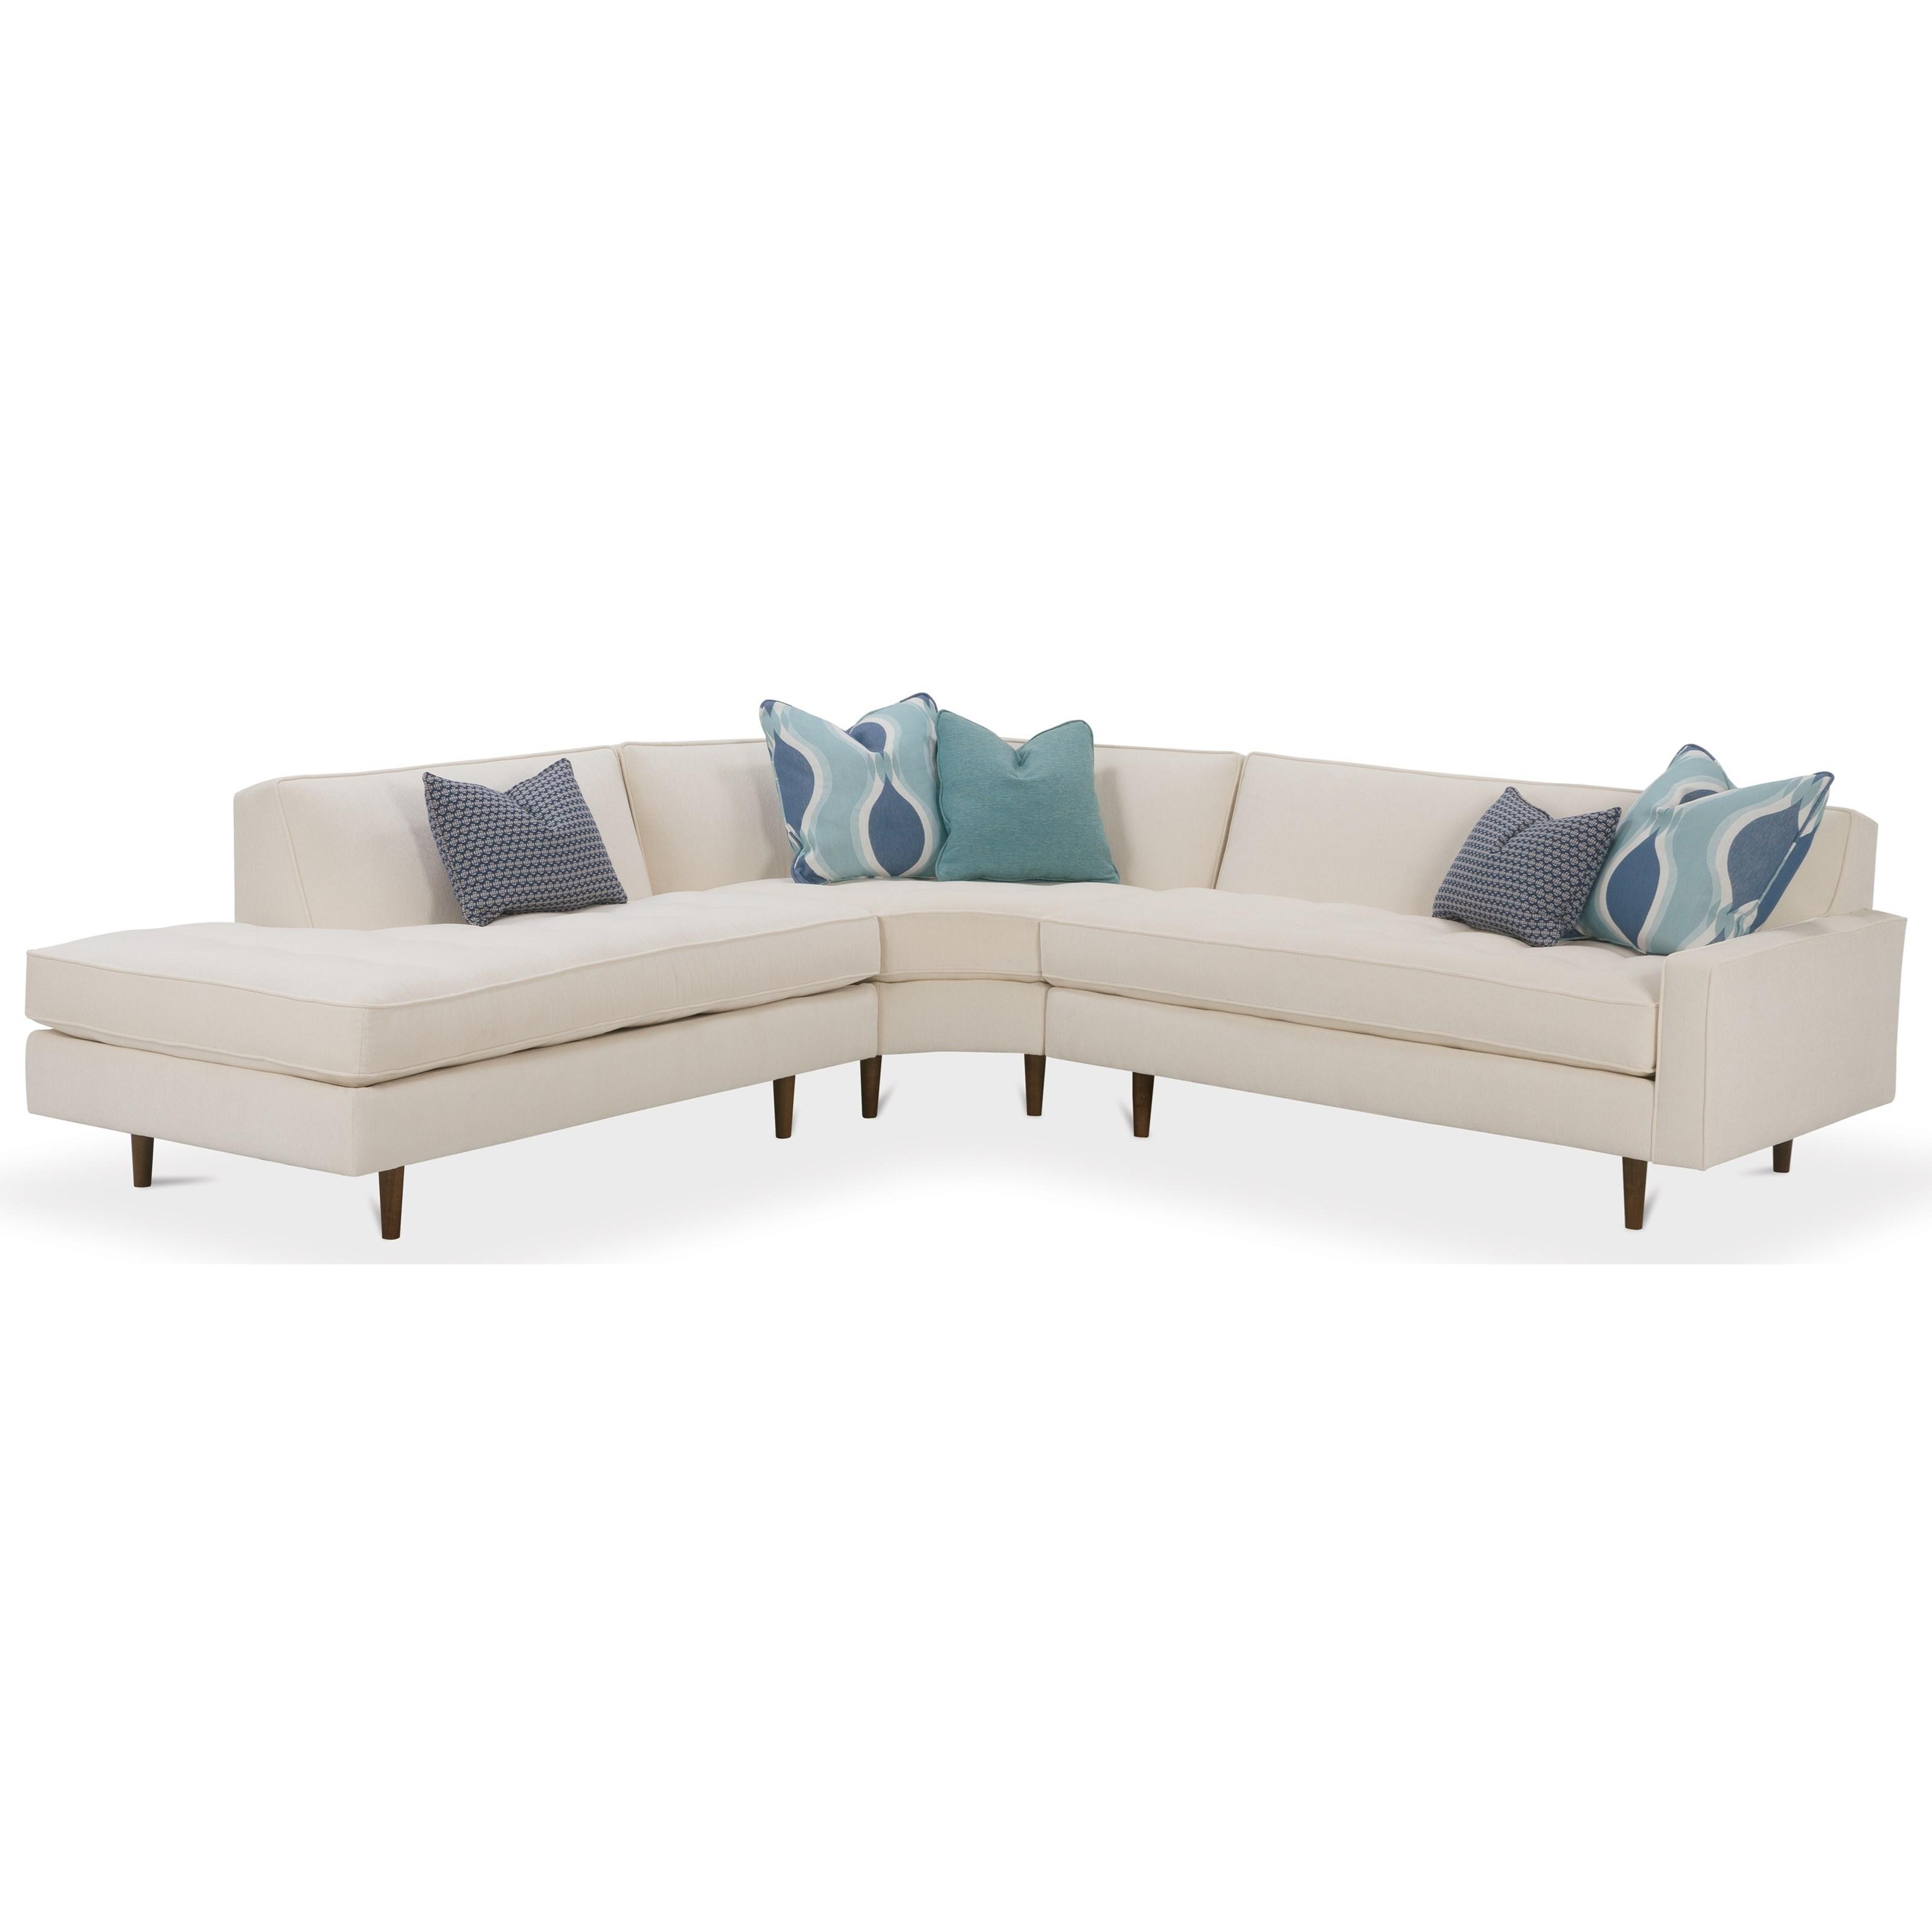 Rowe Brady Contemporary 3 Piece Sectional Sofa ...